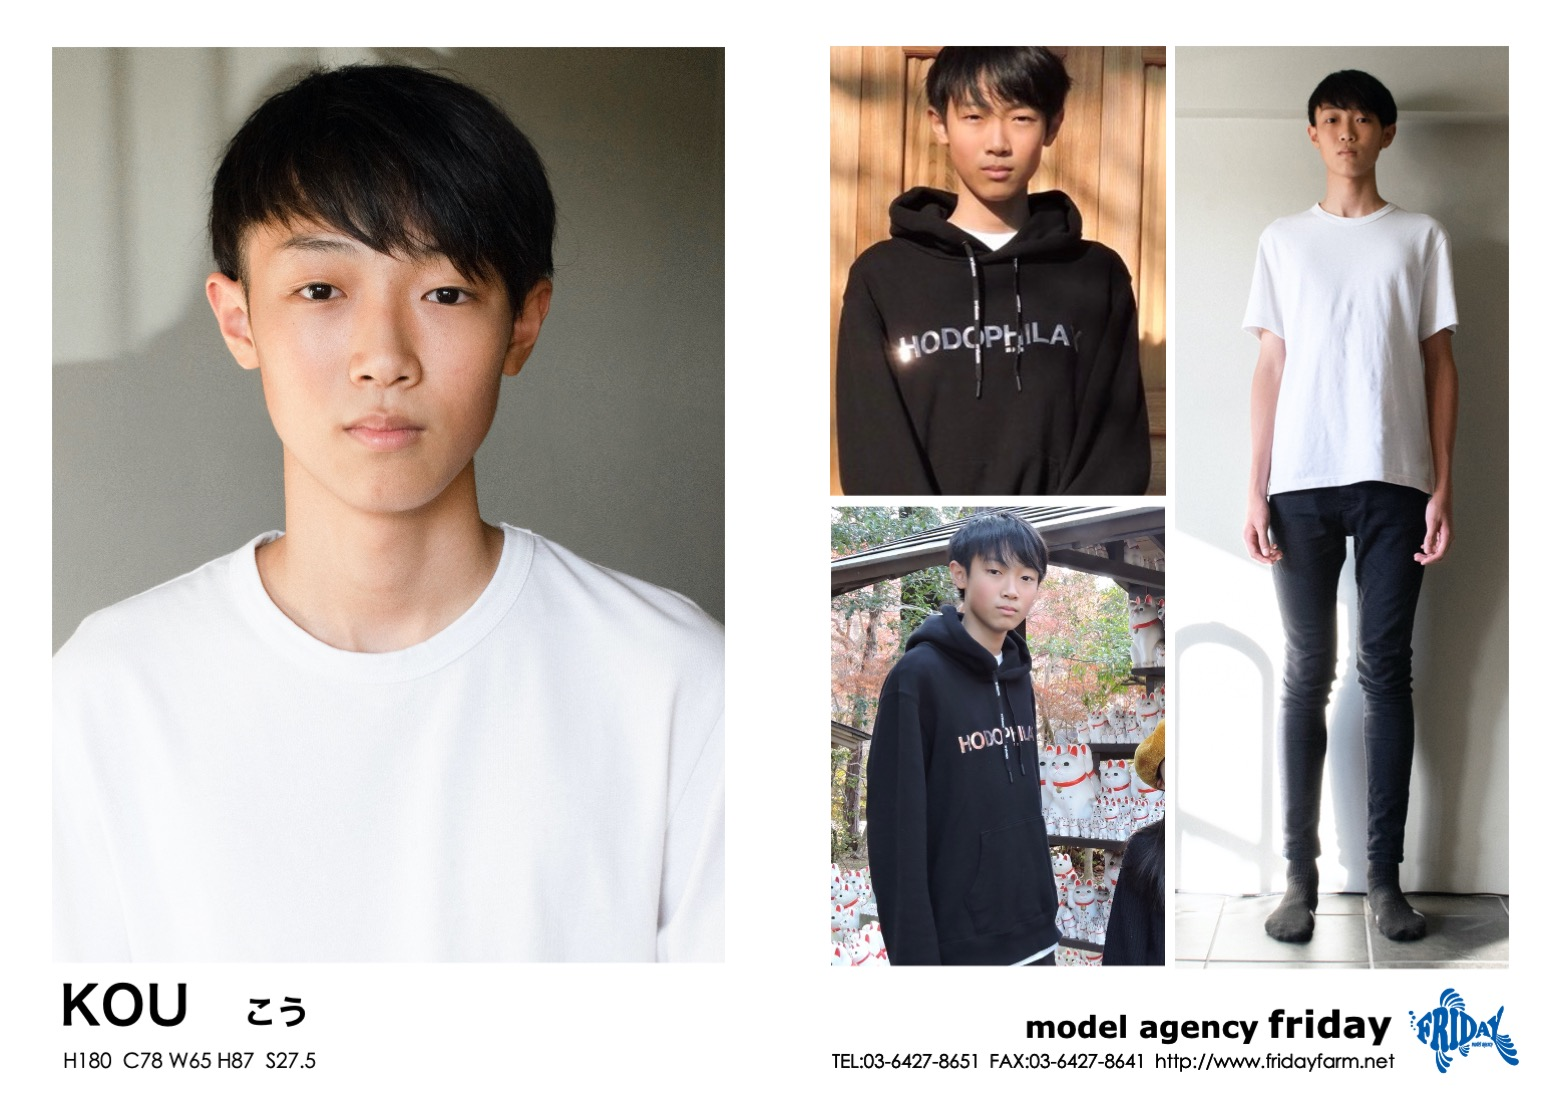 KOU - こう | model agency friday